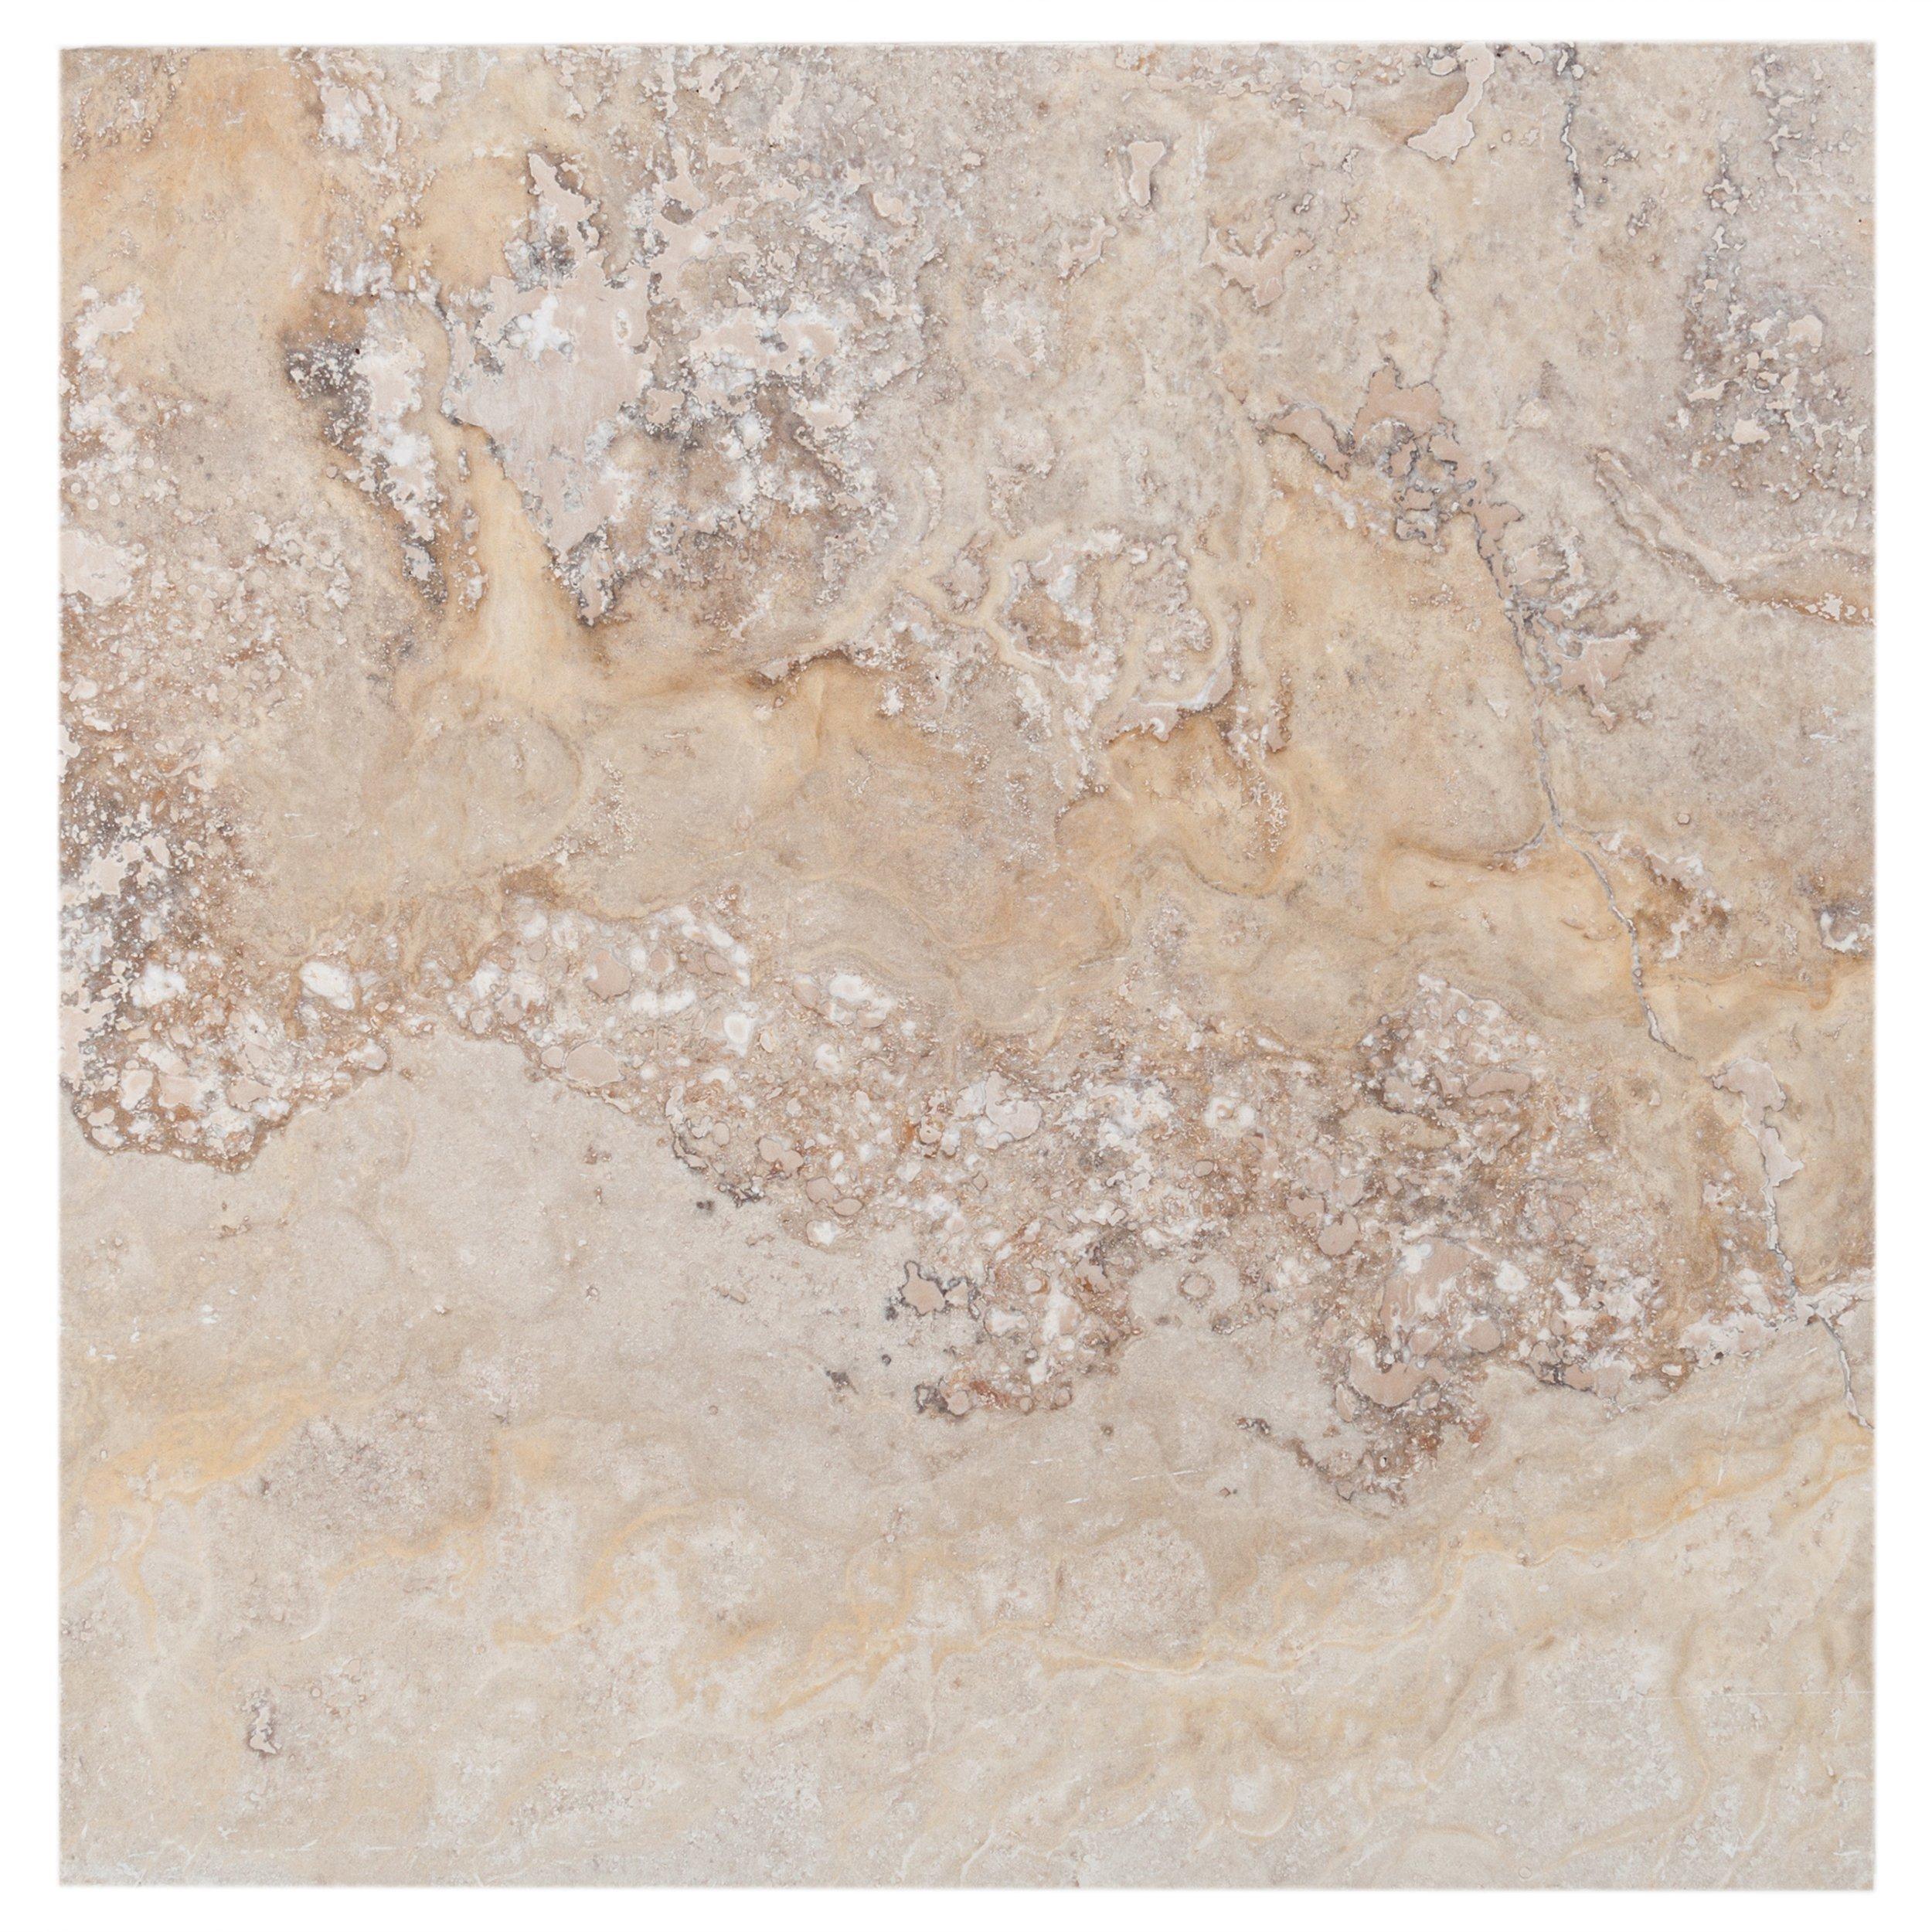 Valencia Travertine Tile - 16 x 16 - 100067446 | Floor and Decor